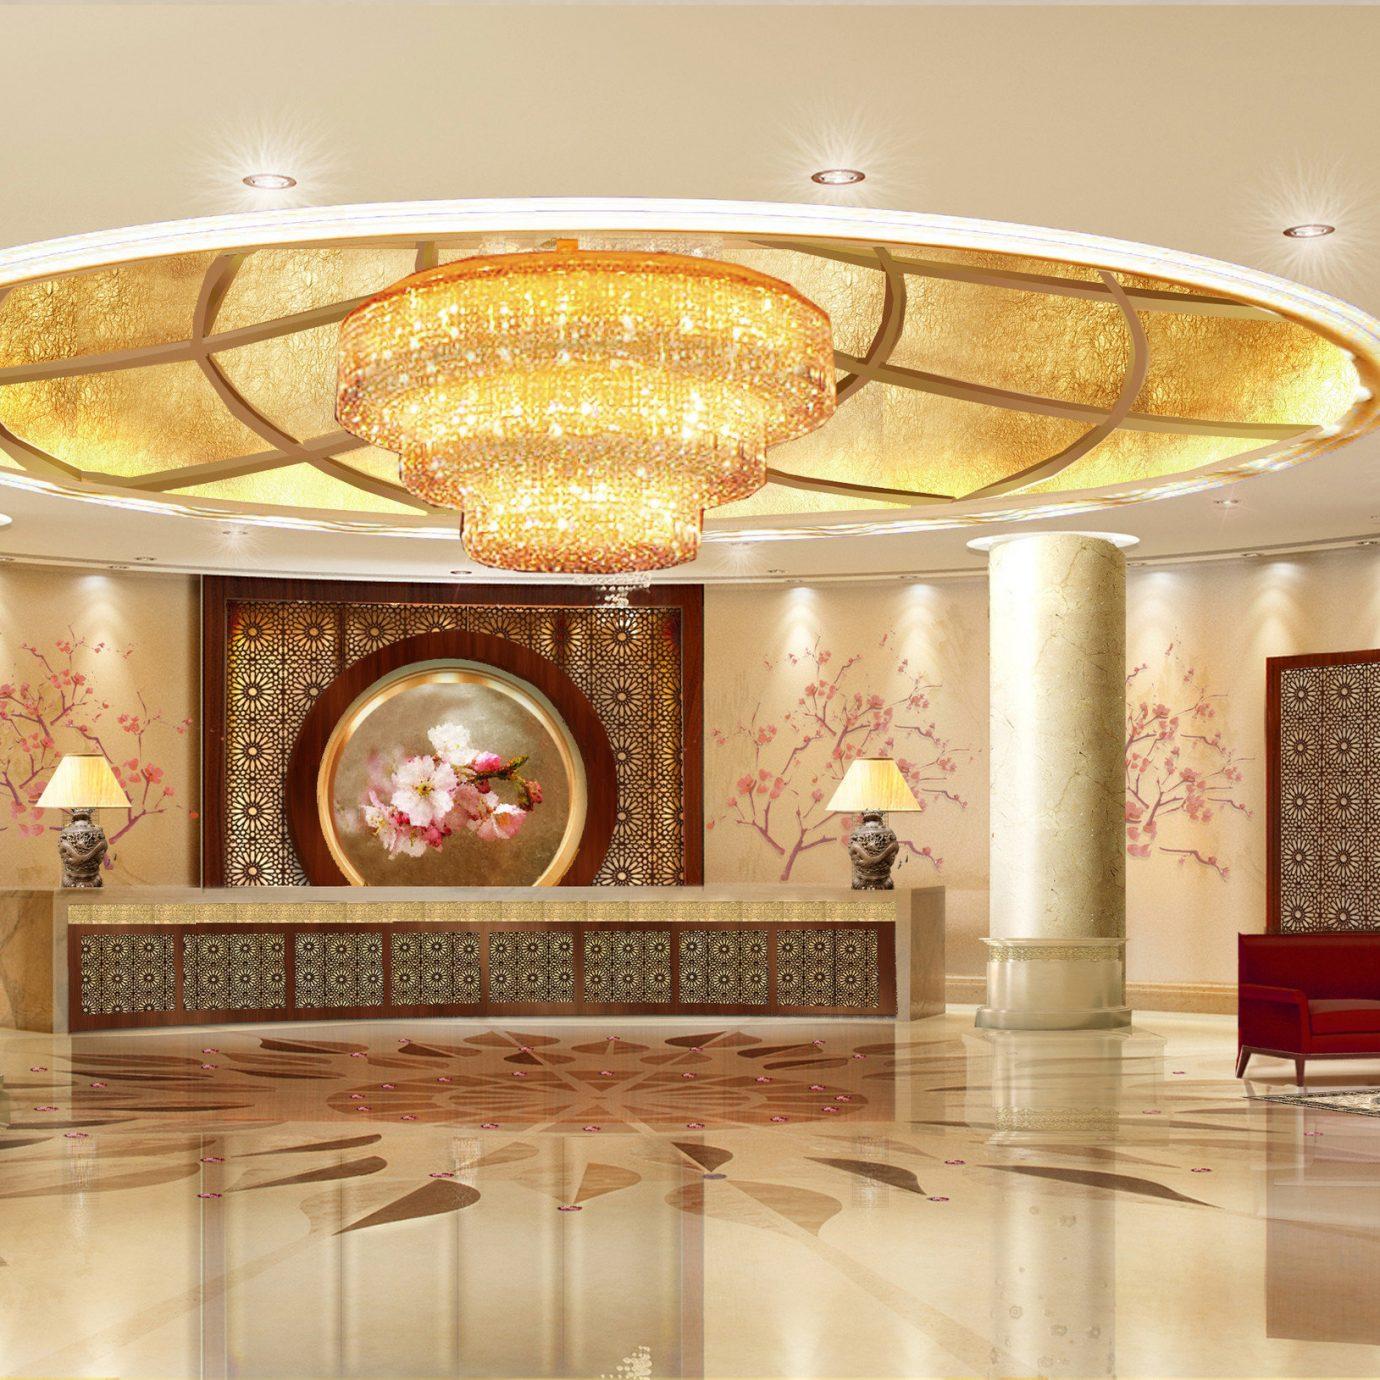 Lobby lighting ballroom